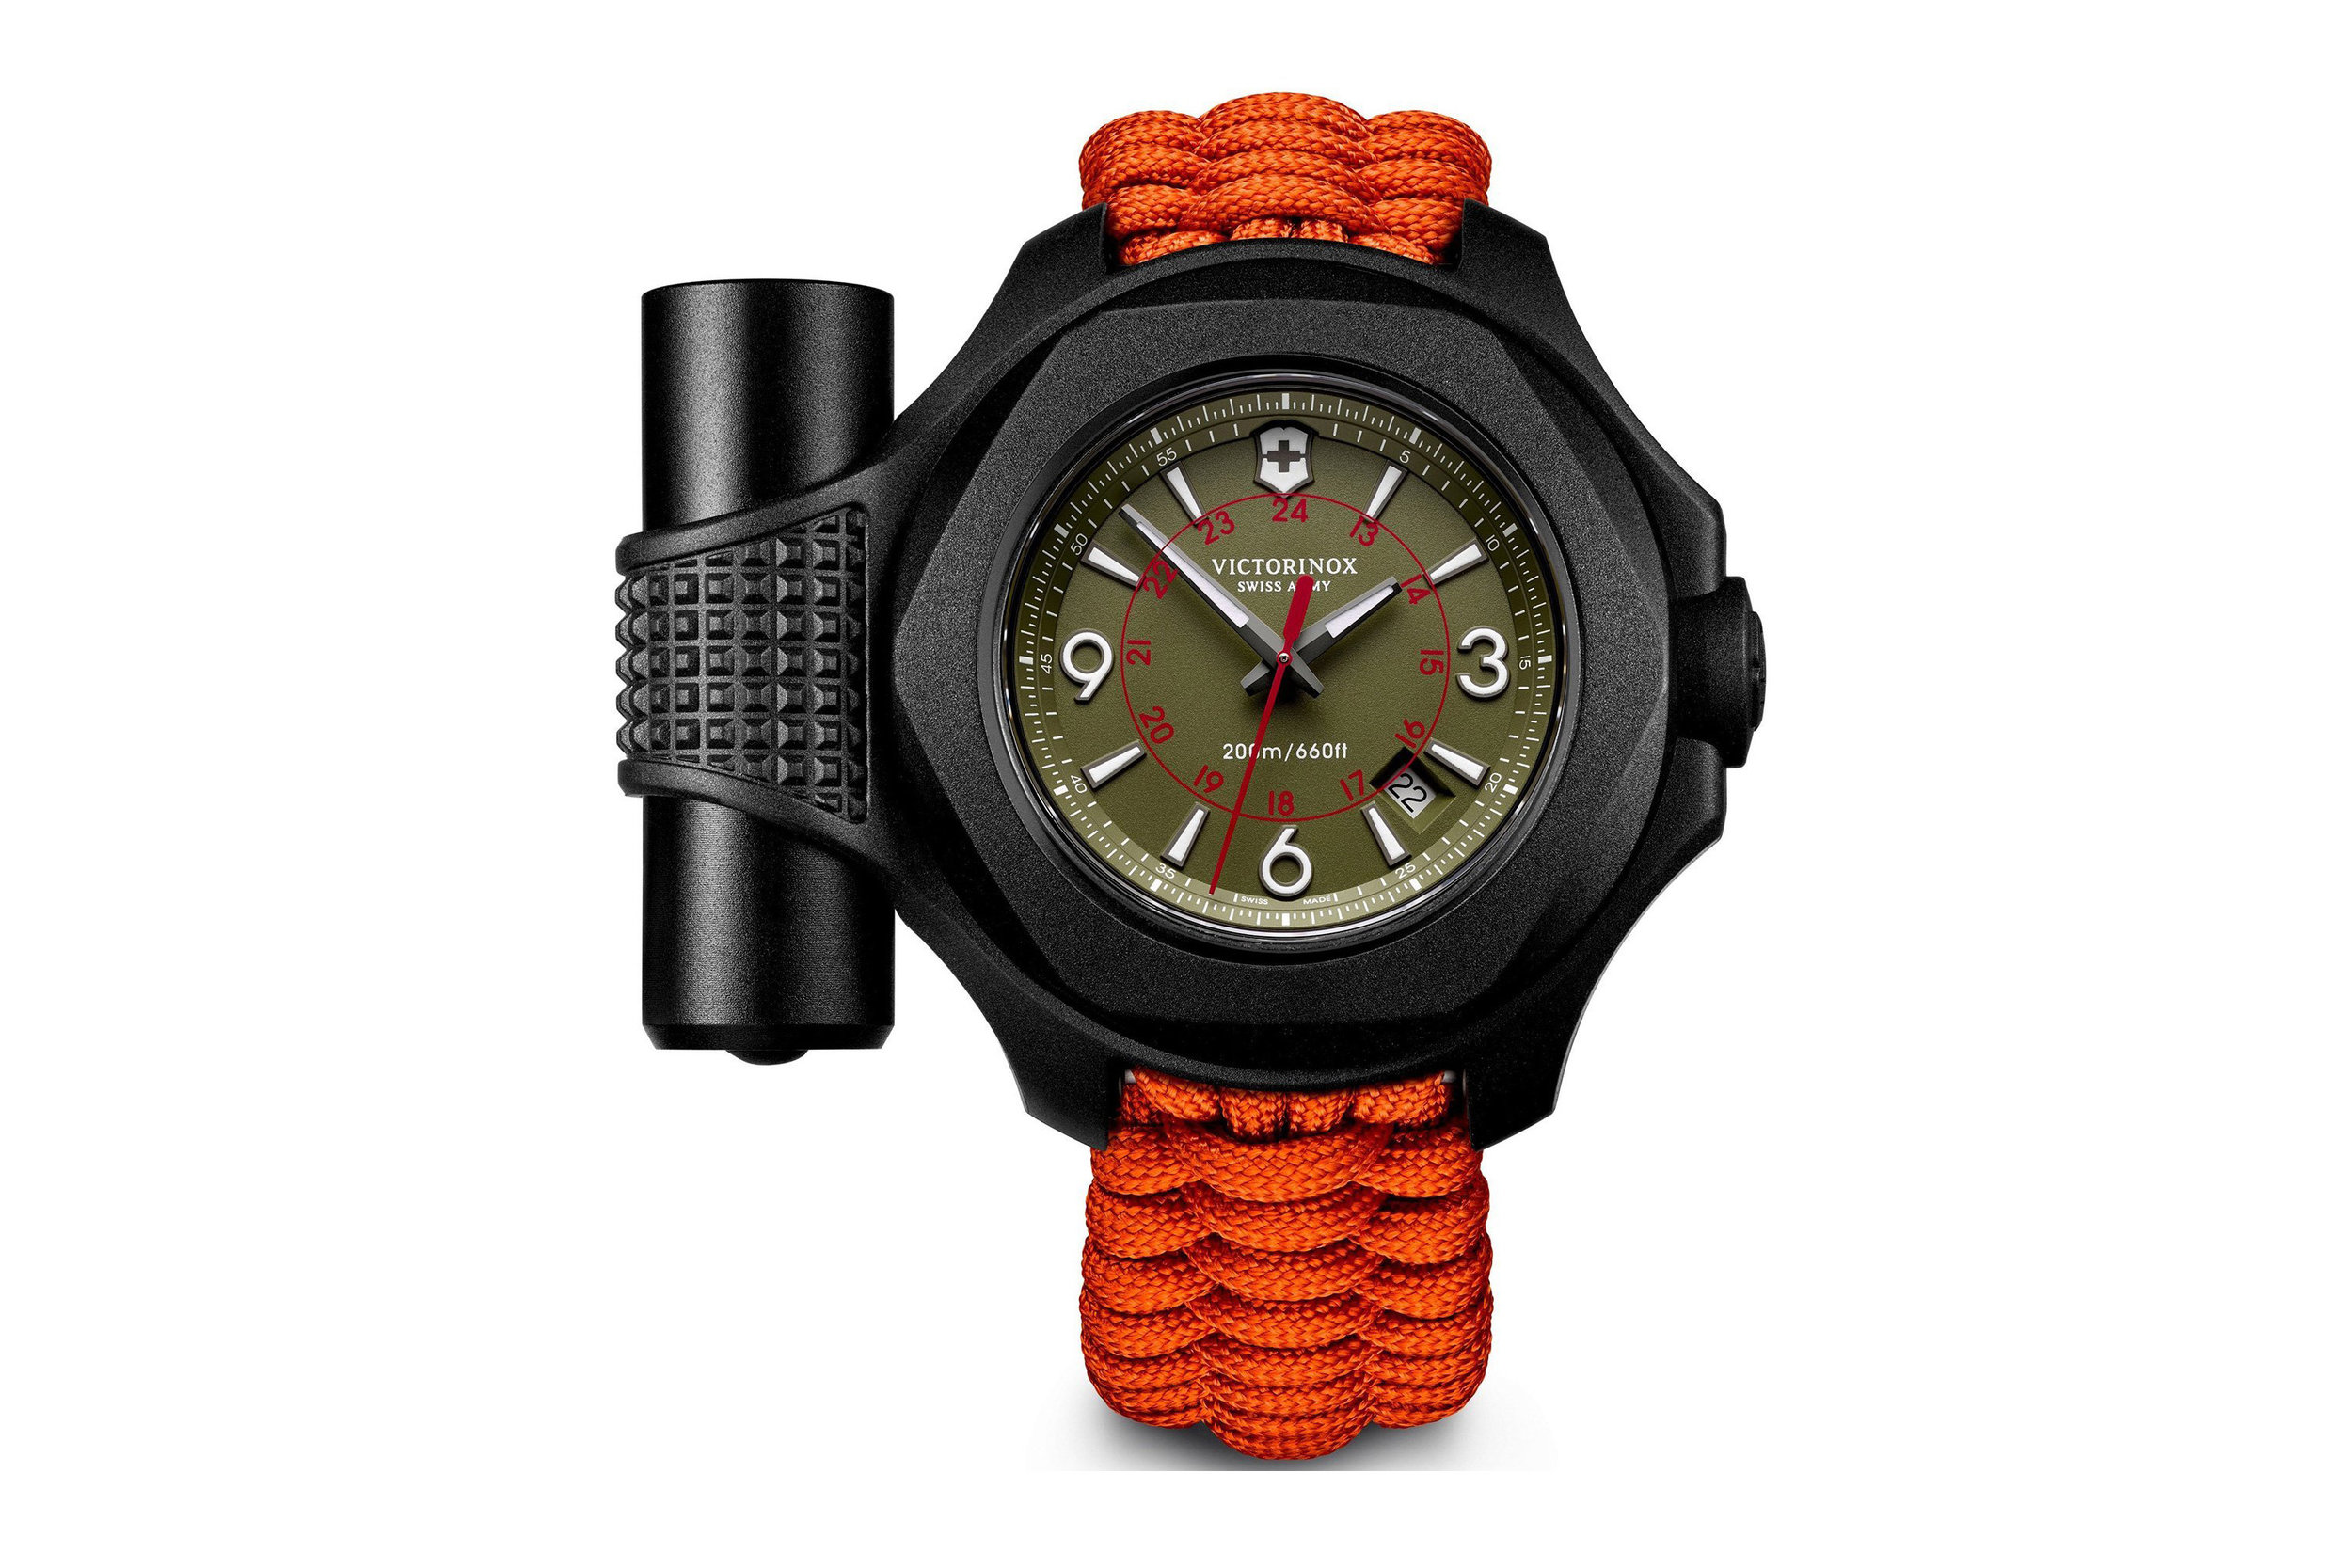 vsa-294-victorinox-swiss-army-inox-carbon-limited-edition-241800-1_2_89614223-186e-4bea-9c5f-7b36e101a0a5.jpg